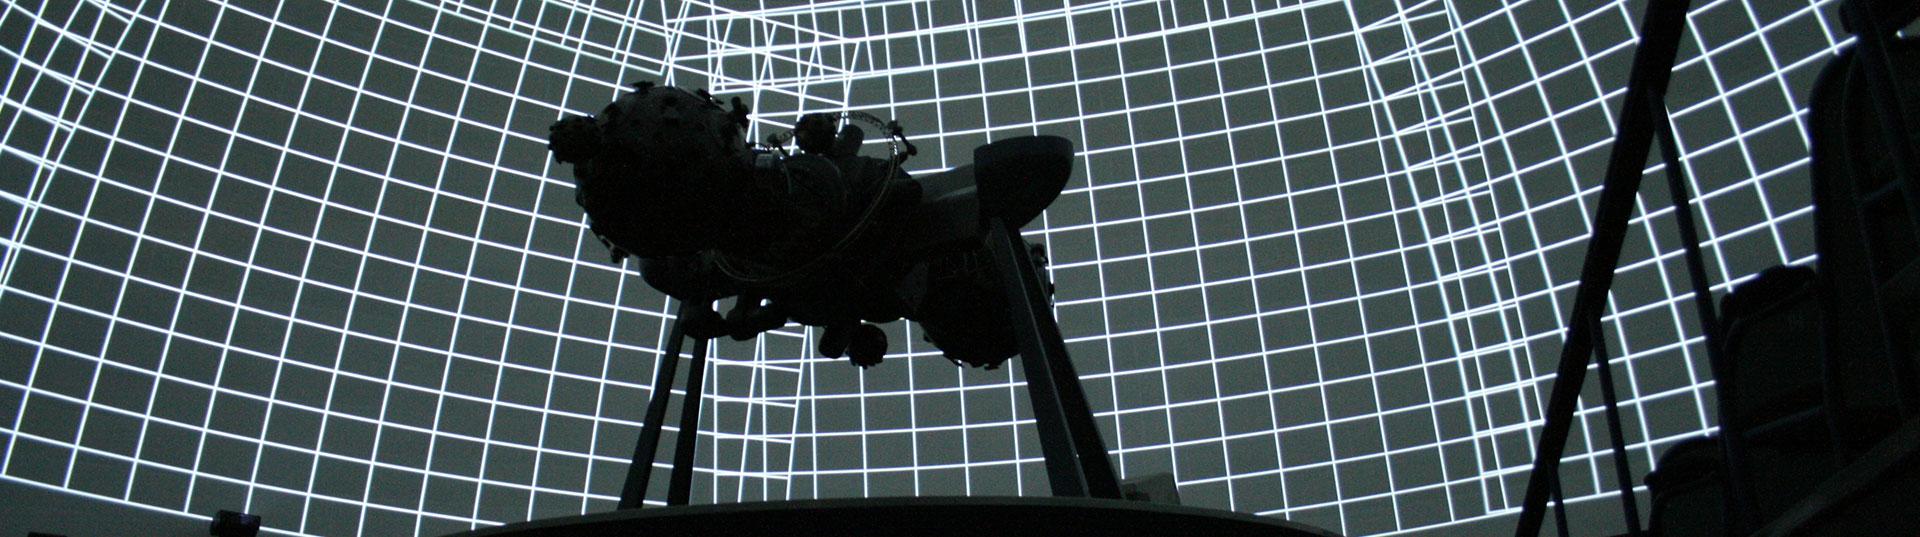 Omnispace360 Technologies